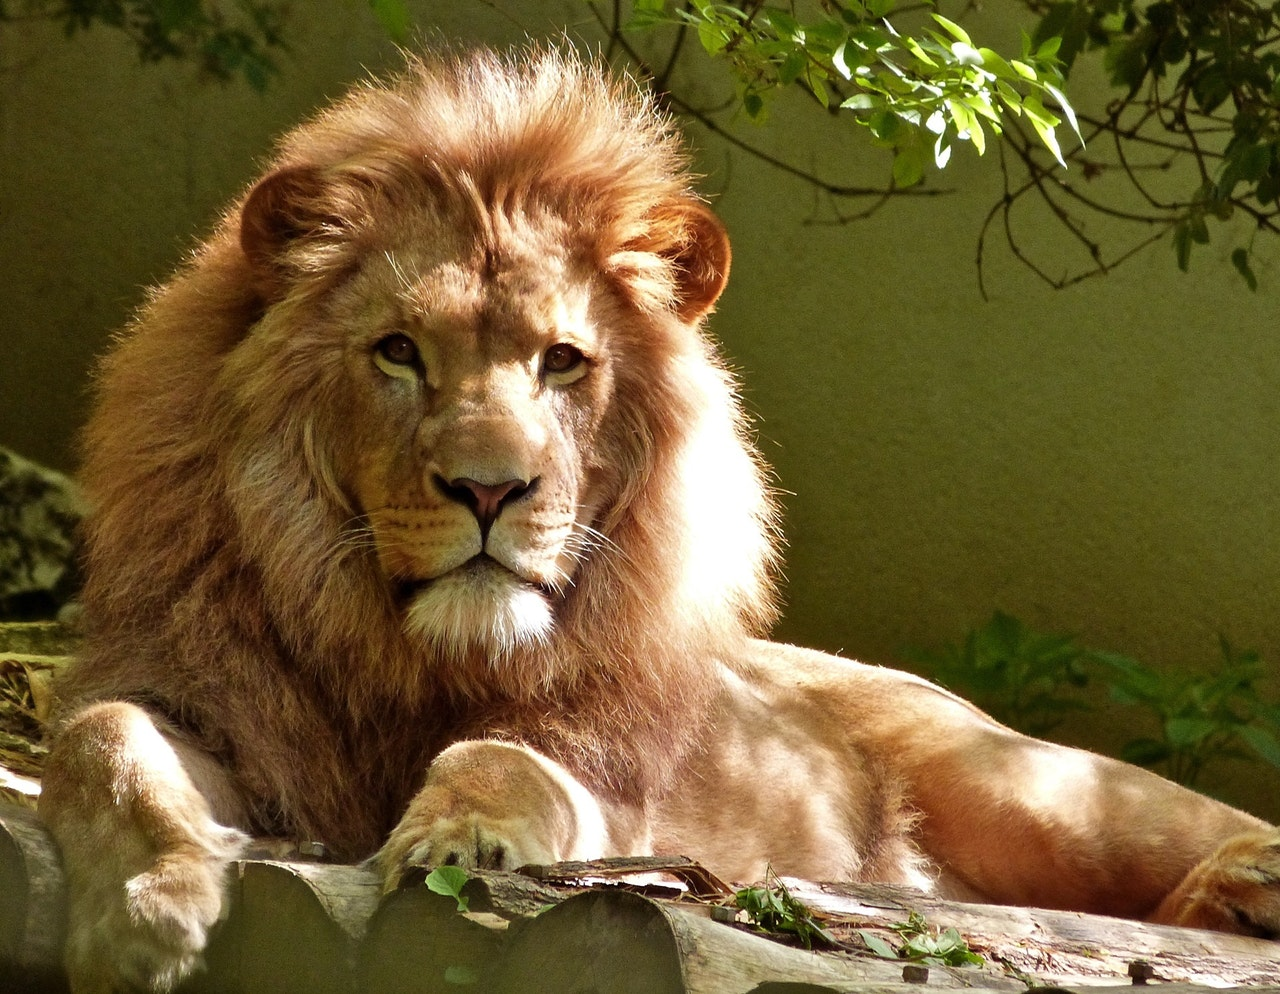 mundo animal leão